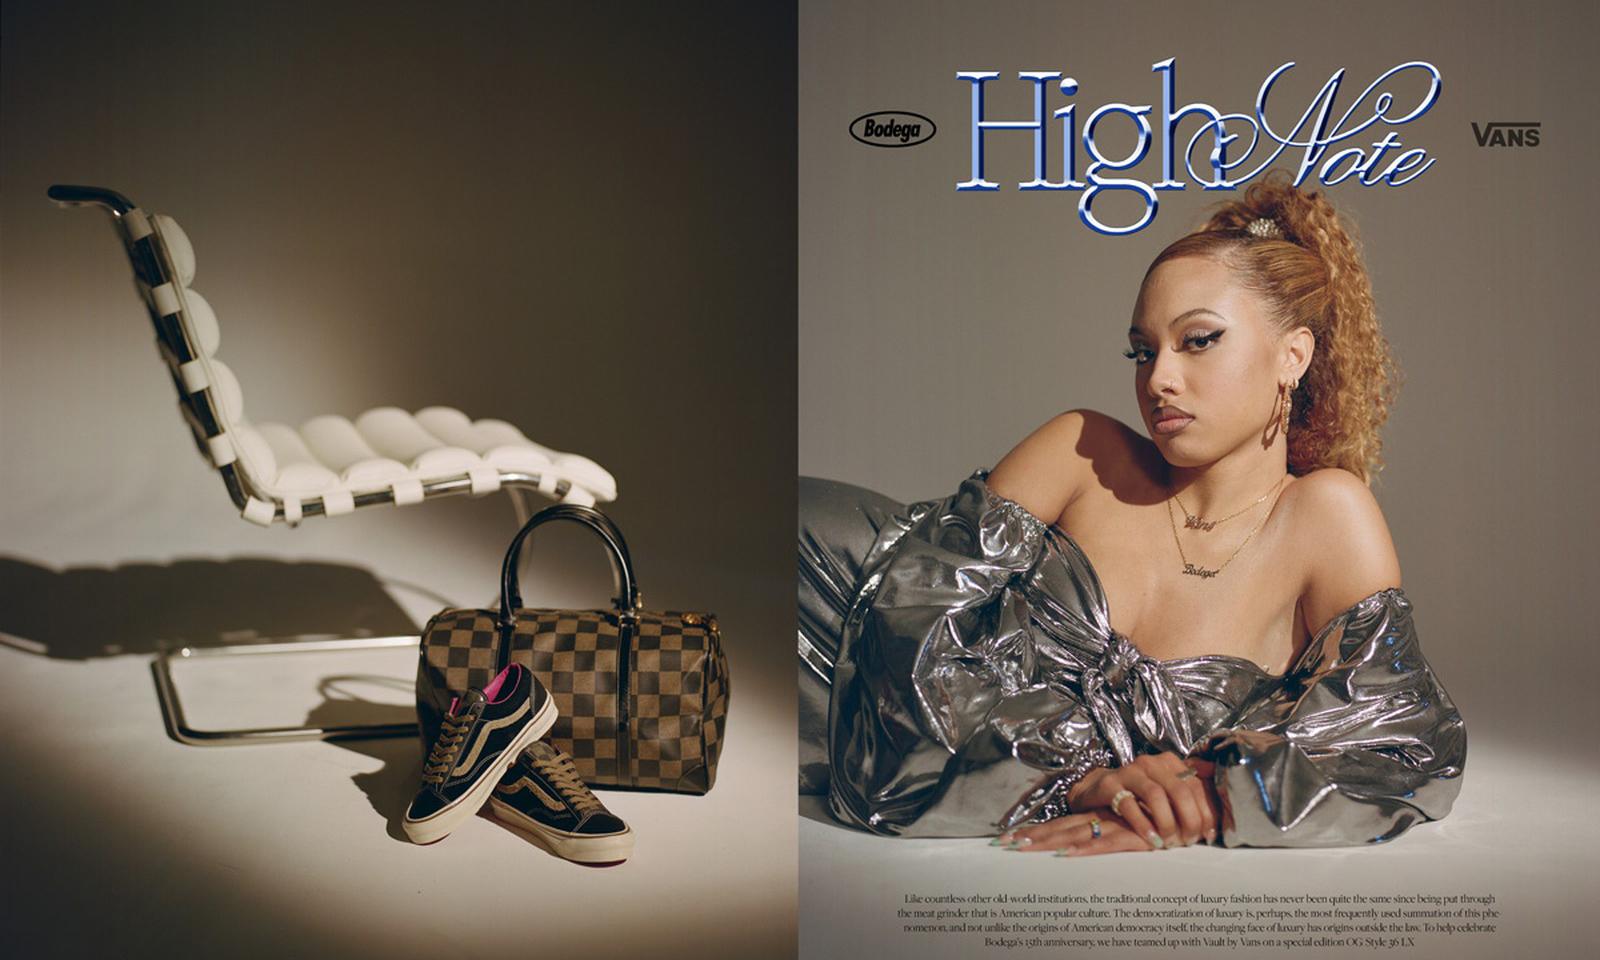 Bodega x Vault by Vans 合作鞋款「High Note」即将发售